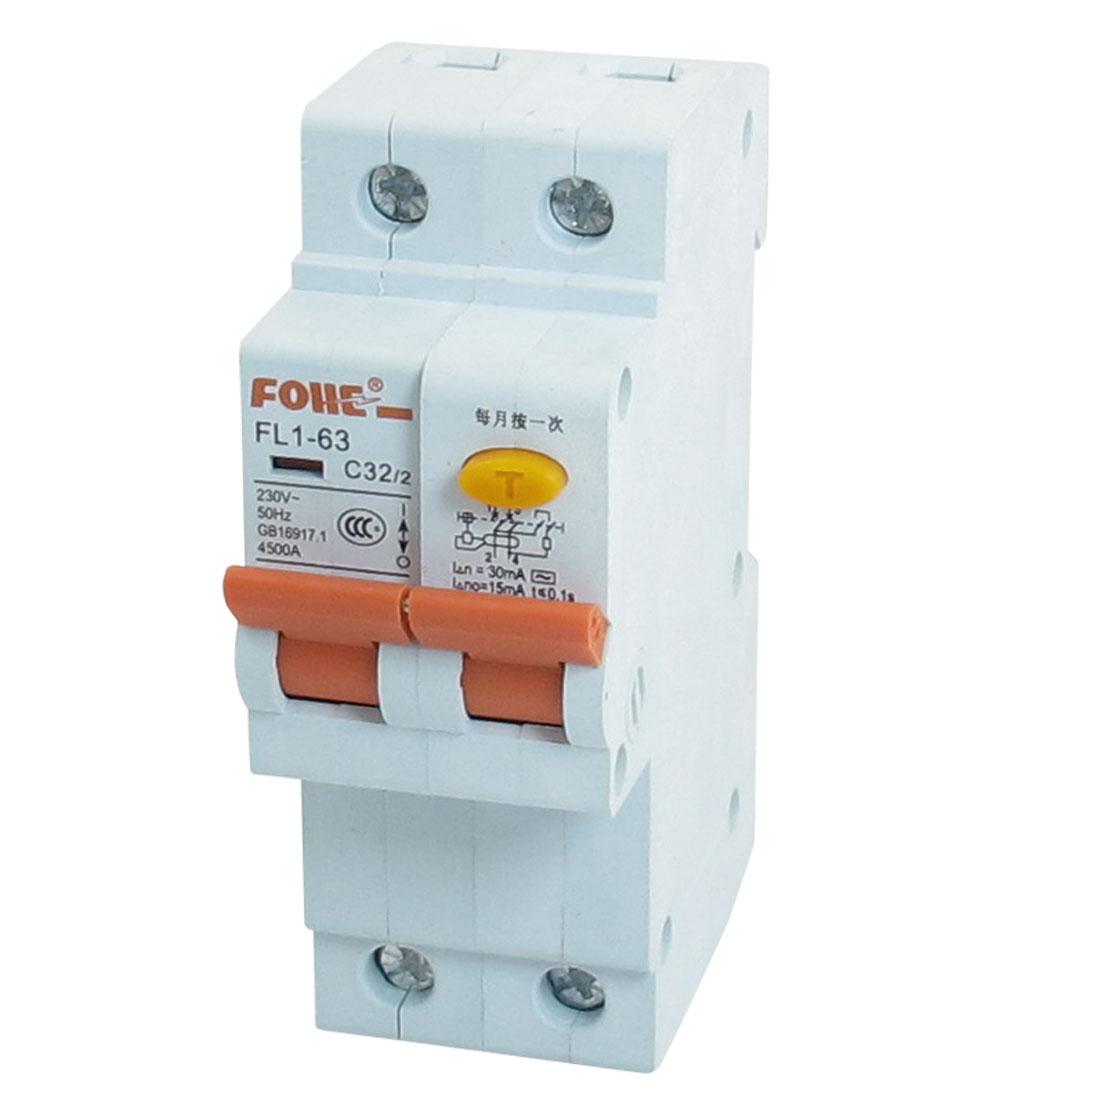 FL1-63 C32 2 Pole DIN Rail Mount MCB Miniature Circuit Breaker 4500A 32A 230V AC